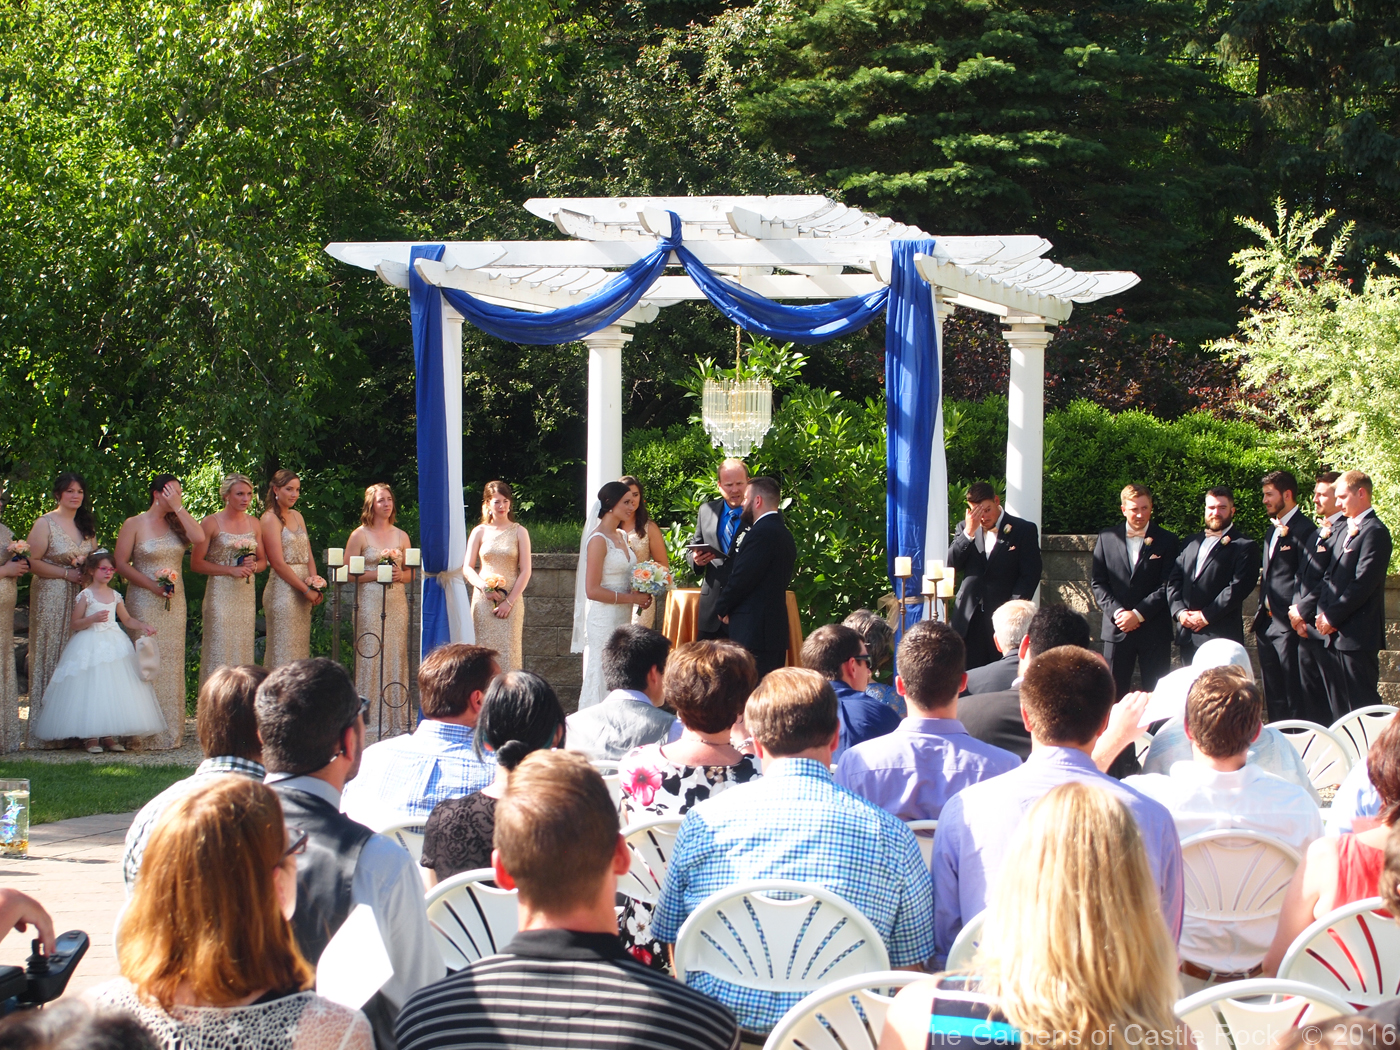 Carri & Sam at The Gardens of Castle Rock ~ Minnesota Garden Wedding - White Pergola on the Grand Promenade